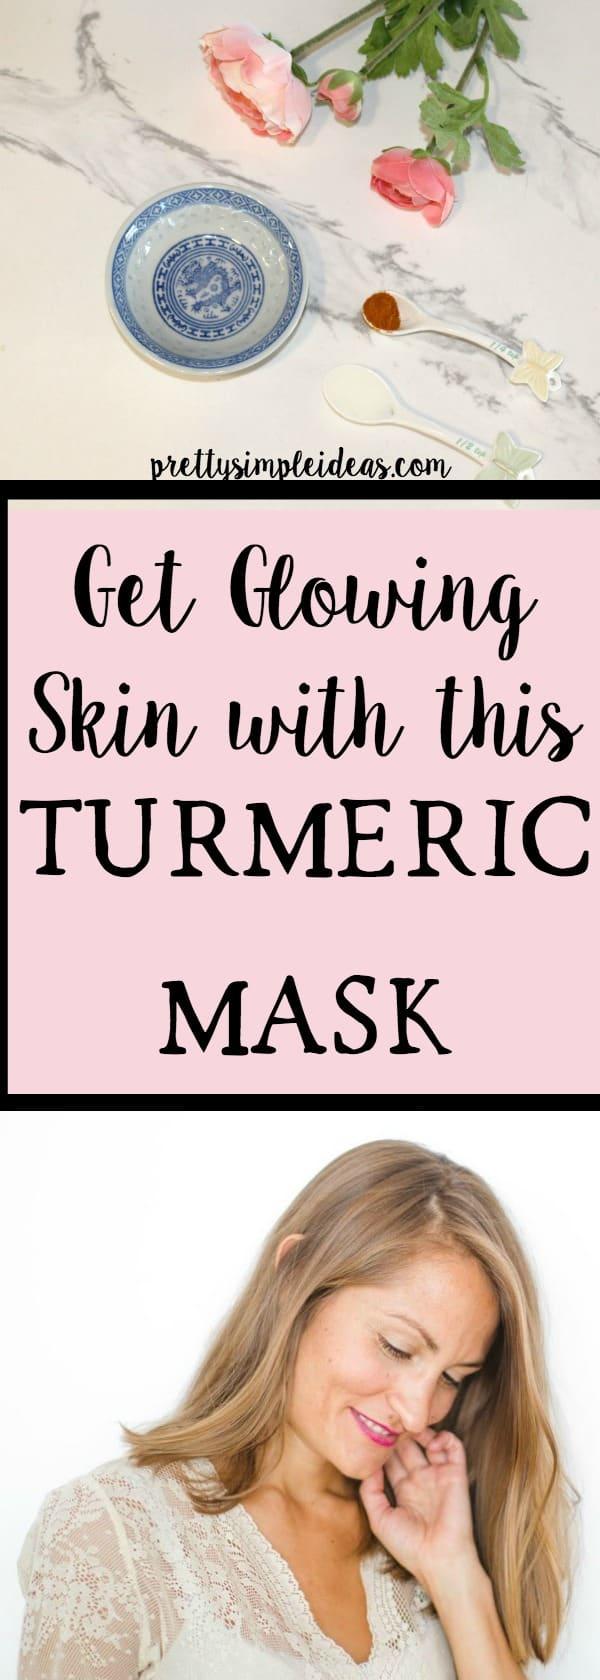 Turmeric Mask | DIY